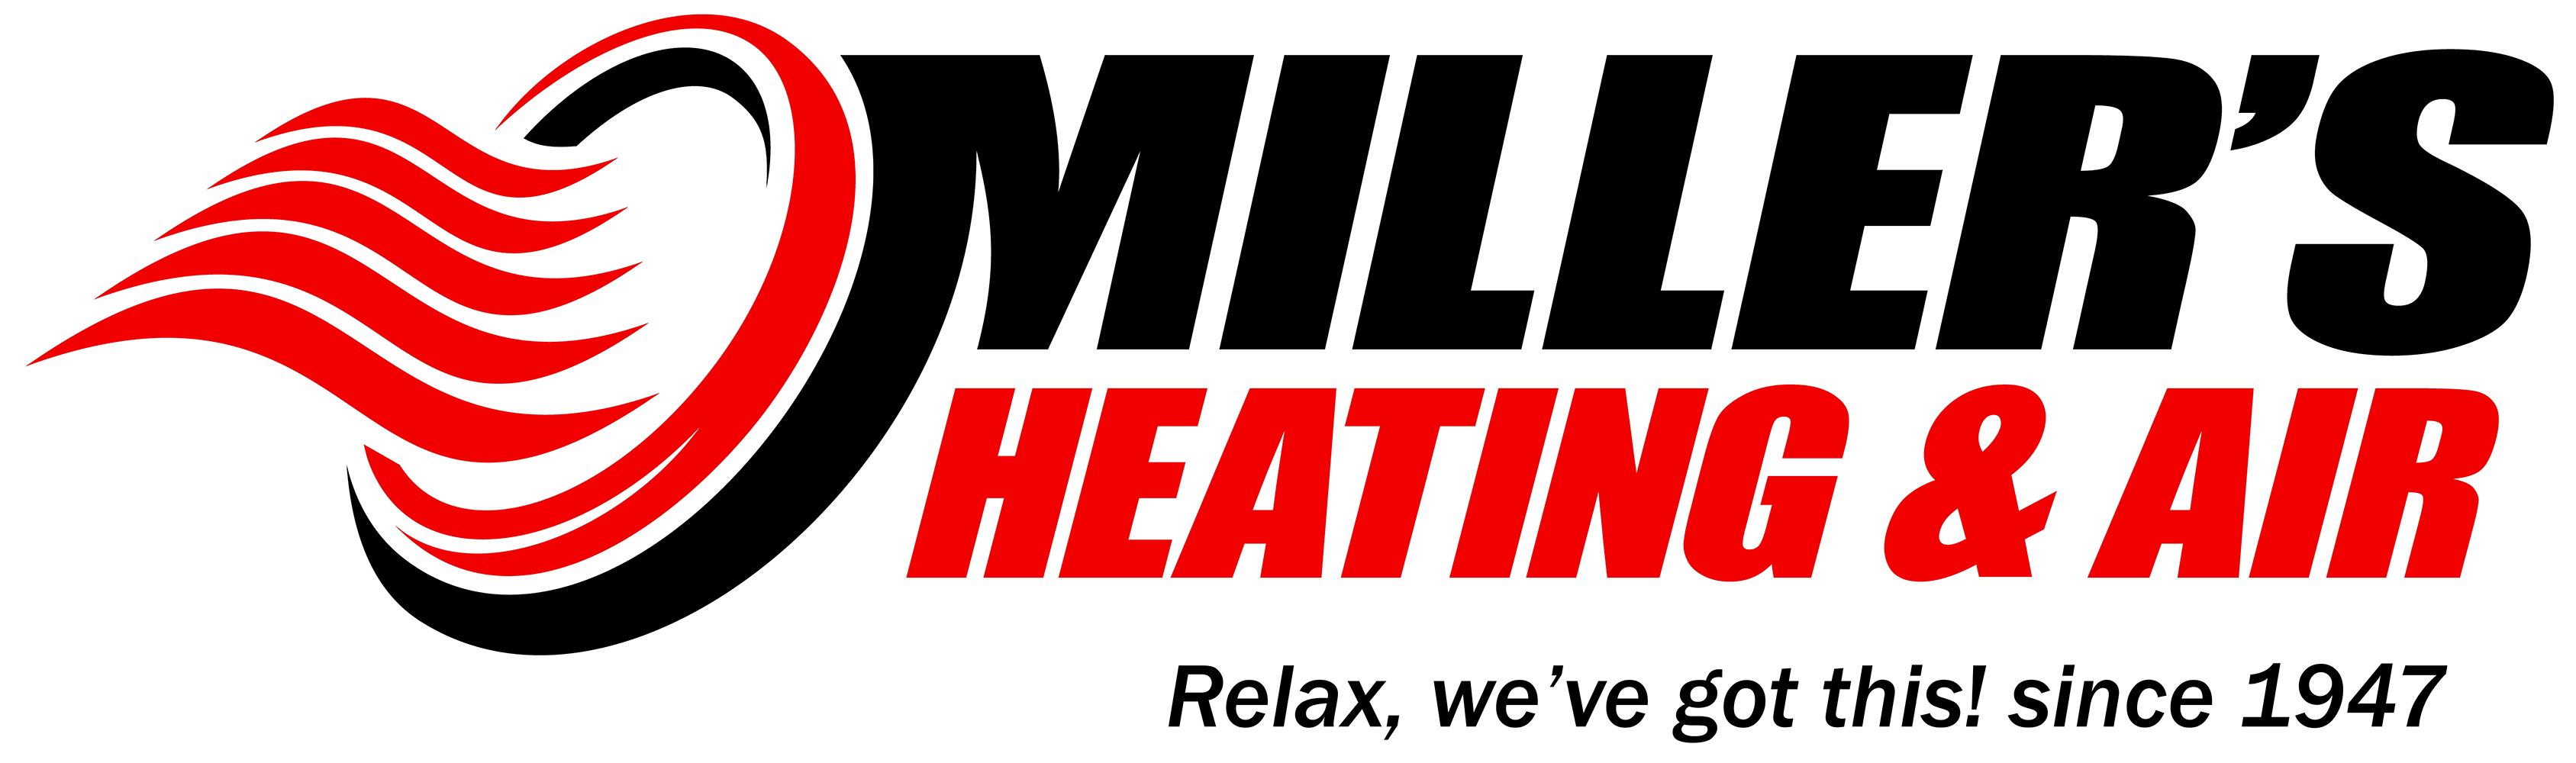 Miller's Heating & Air